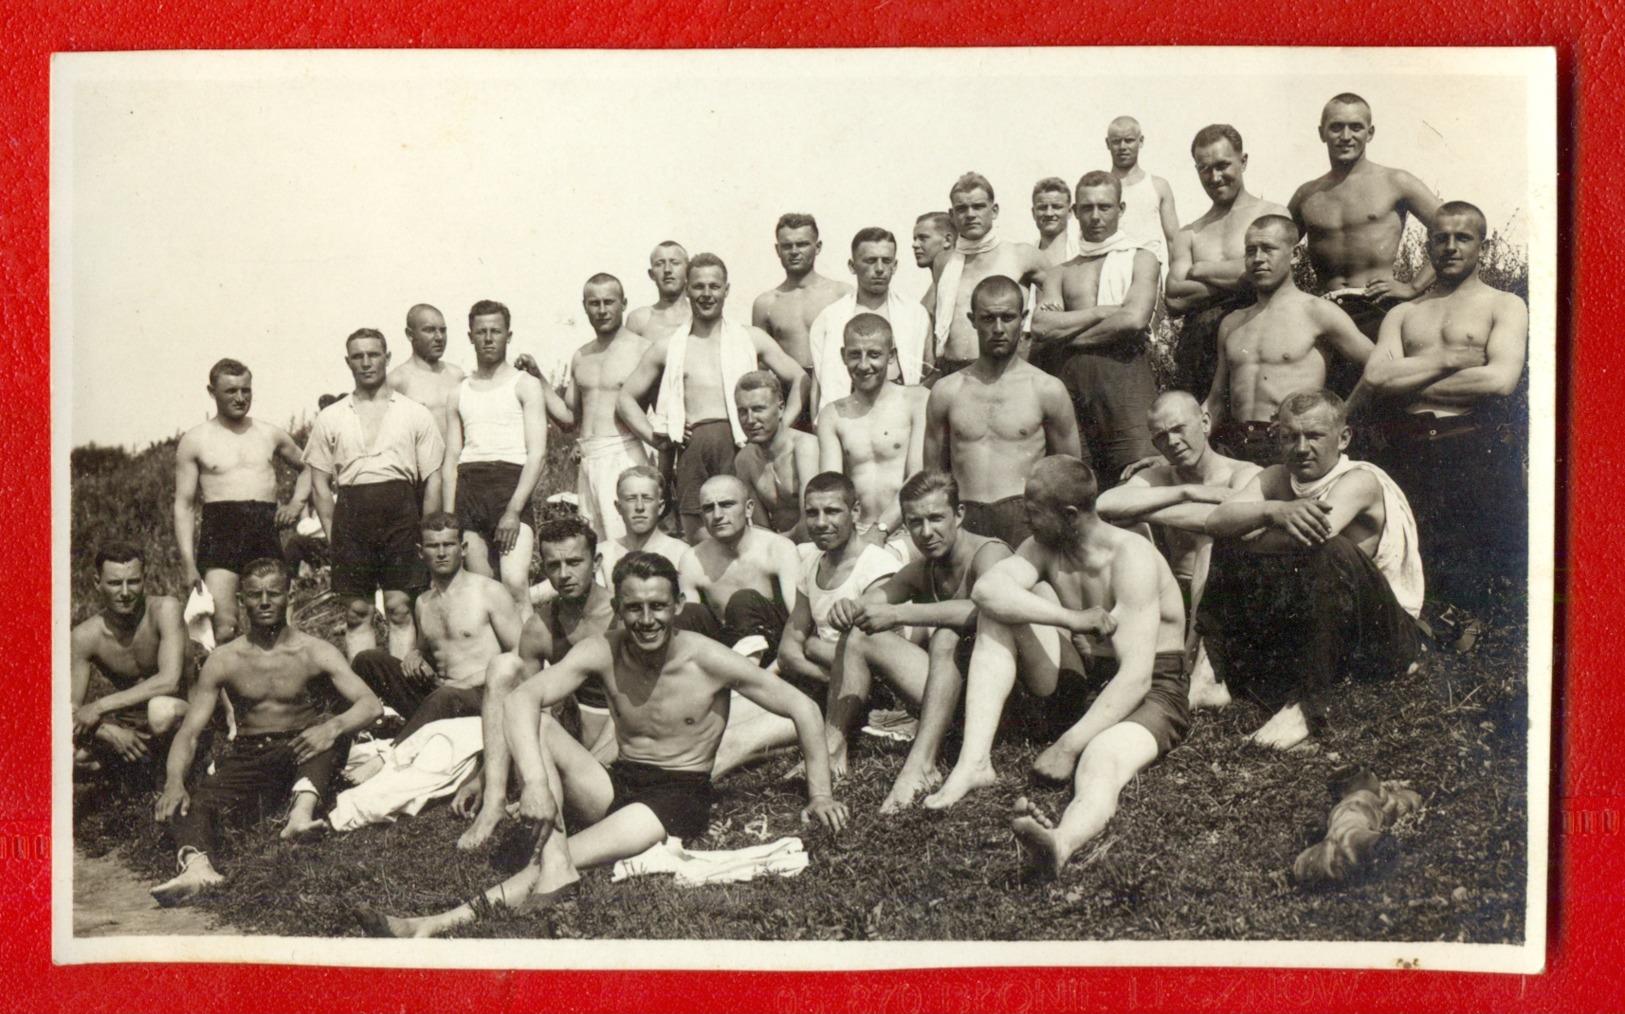 MEN SEMI NUDE VINTAGE PHOTO CARD 1608 - Männer < 1945